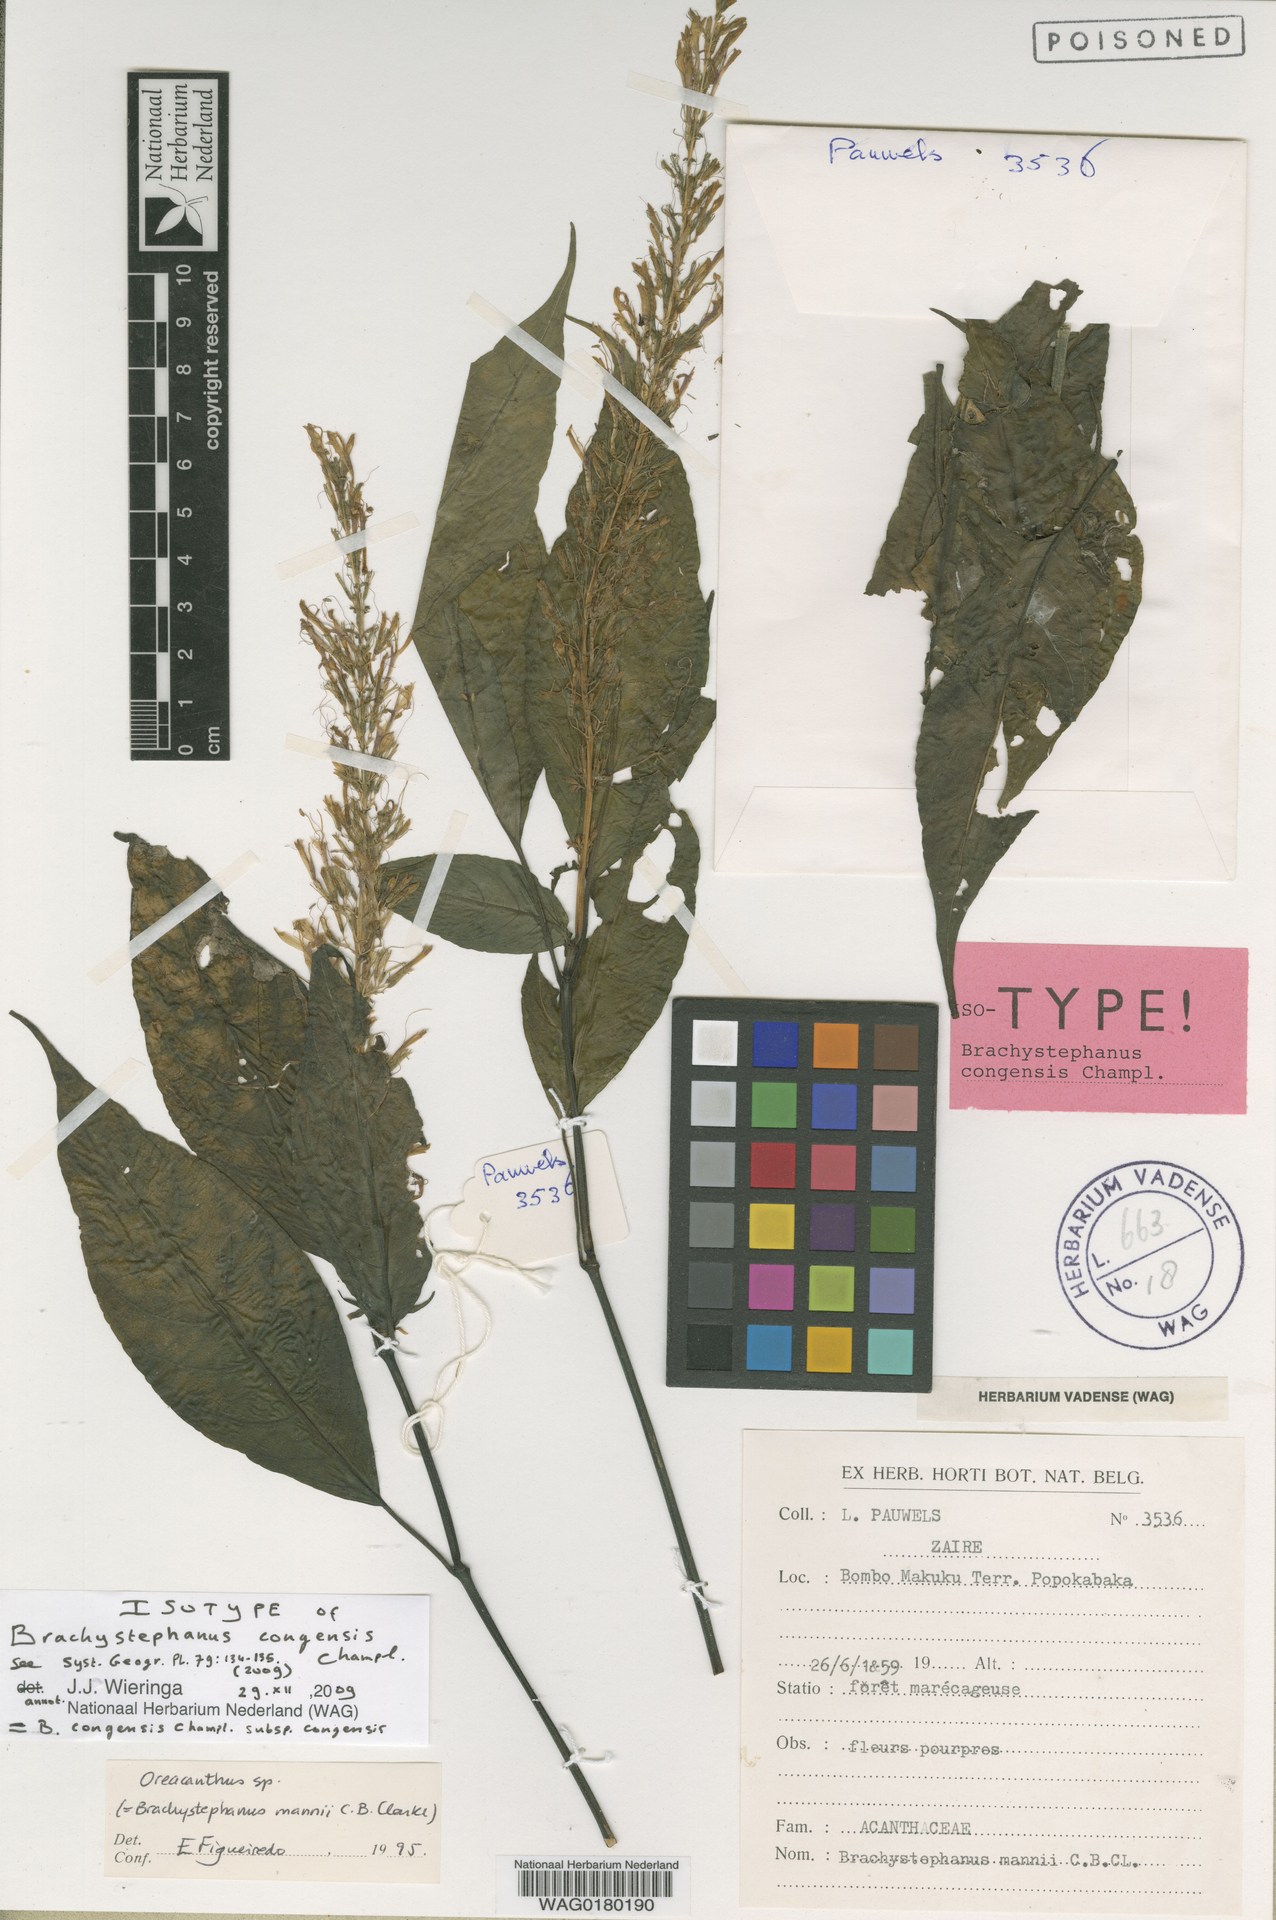 WAG.1734514 | Brachystephanus congensis subsp. congensis